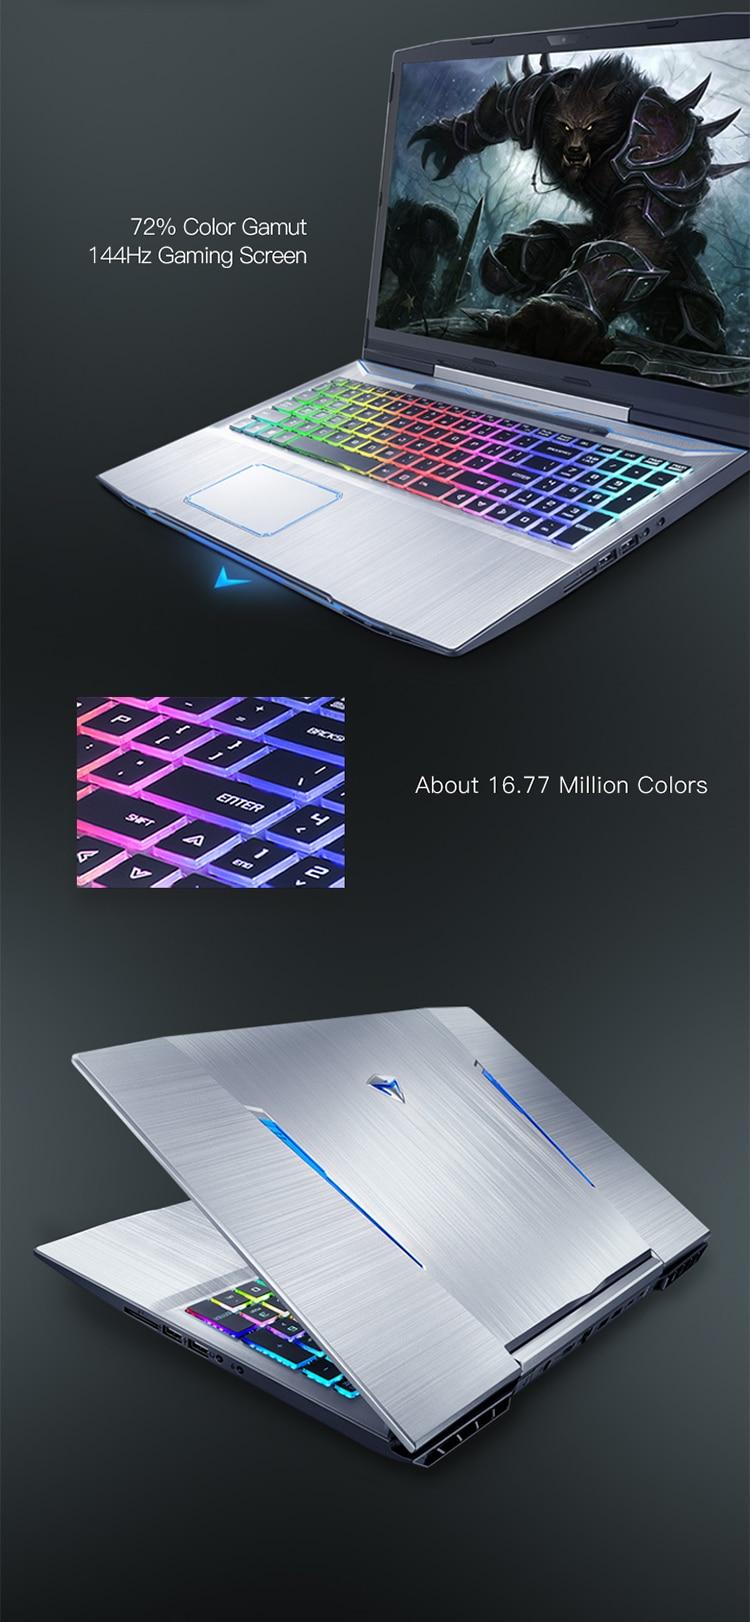 H5228e6054edb45c491f5d1192bb244e8r Machenike T90-T6C Gaming Laptop (Intel Core i7-8750H+GTX 1060 6G/8GB RAM/256G SSD/15.6'' 144Hz72%NTSC) Machenike-brande notebook